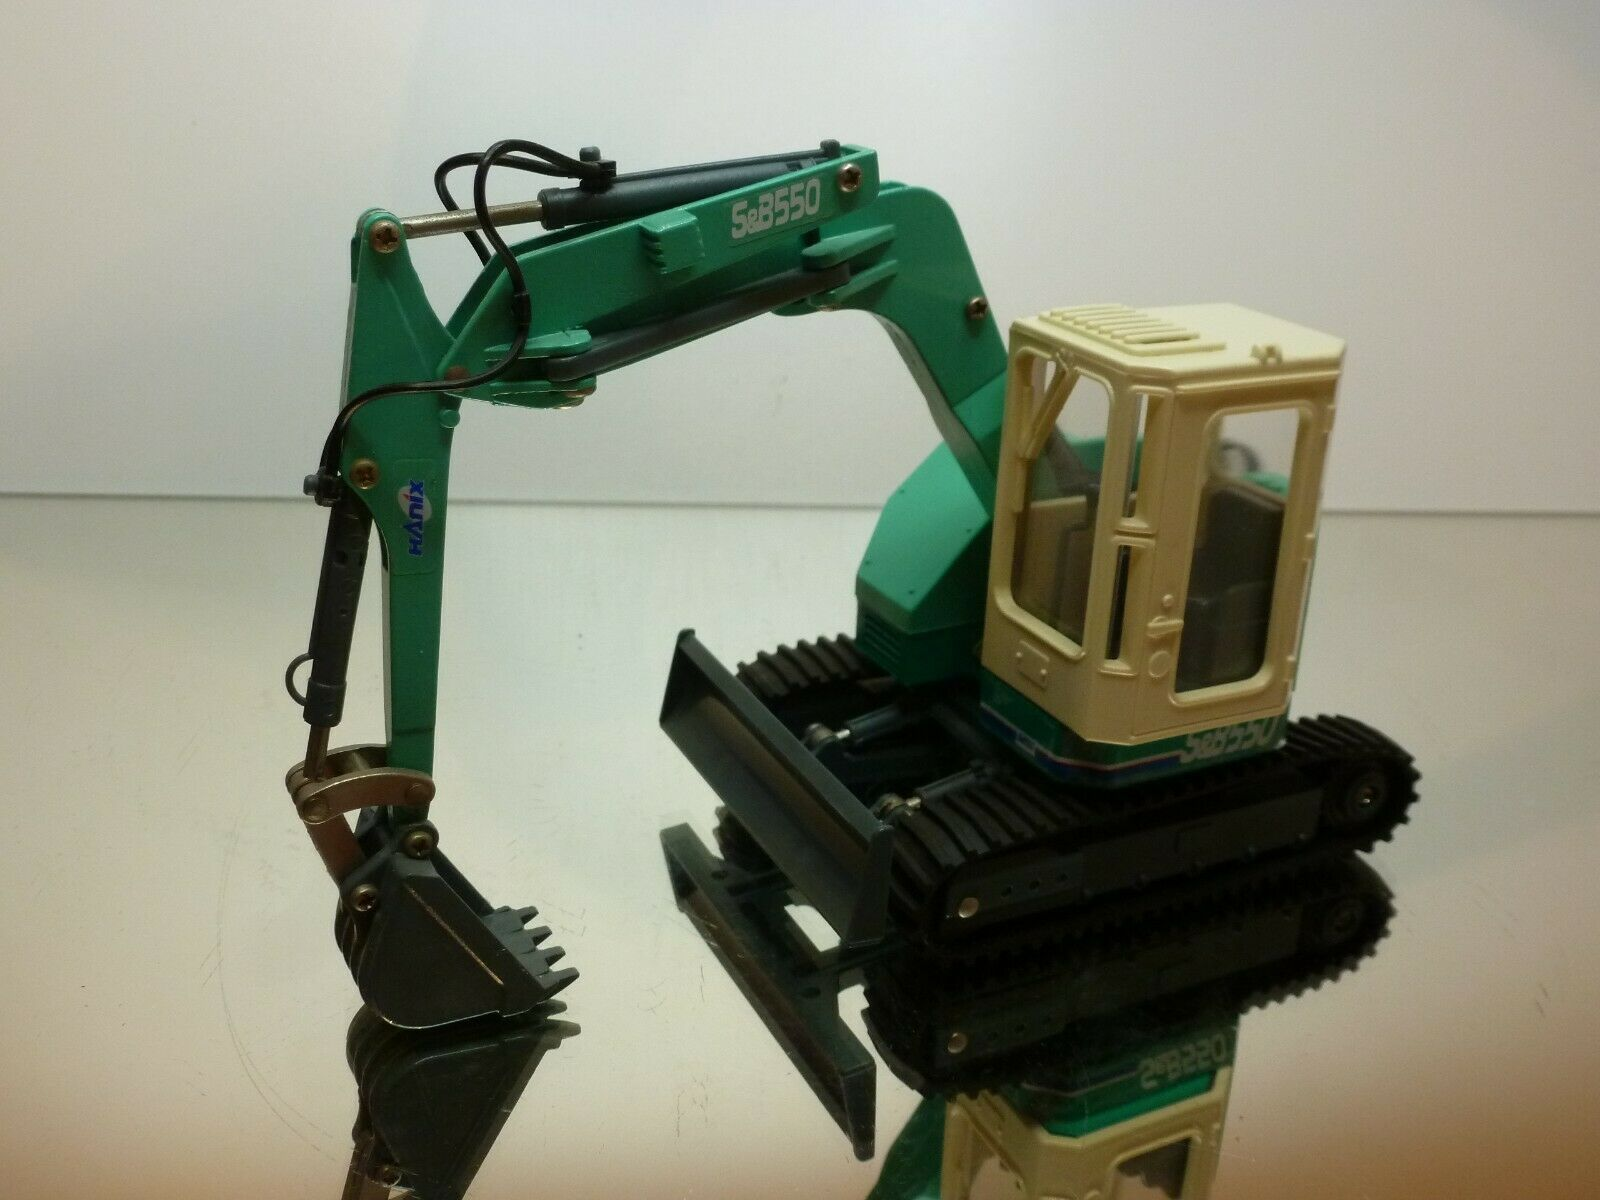 DIAPET YONEZAWA 014 HANIX S&B550 EXCAVATOR - verde 1 26 - VERY GOOD CONDITION